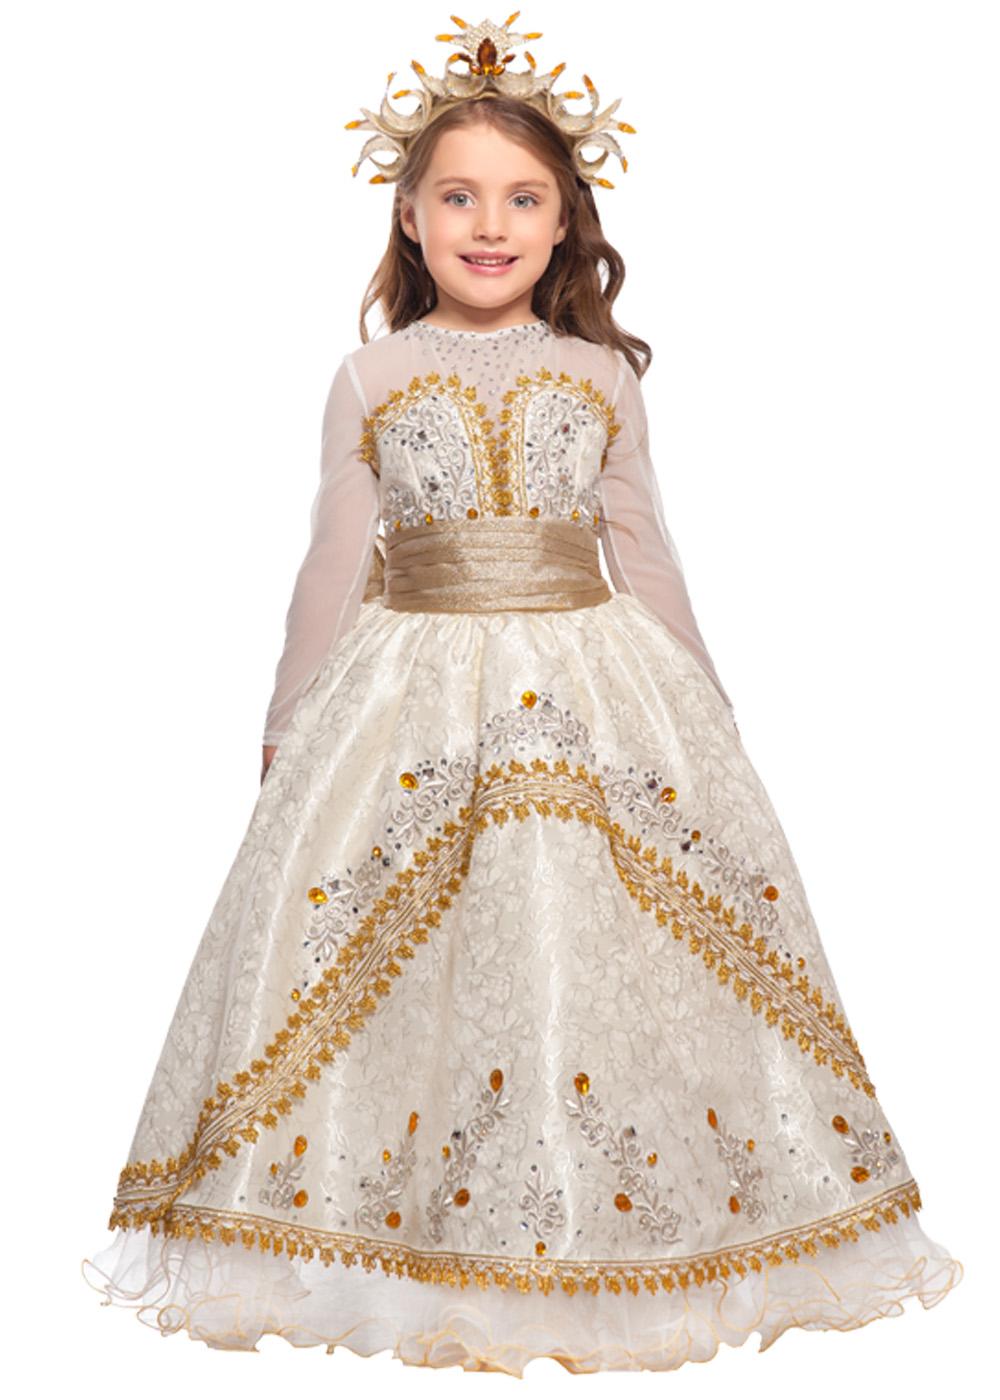 Принцесса Мария